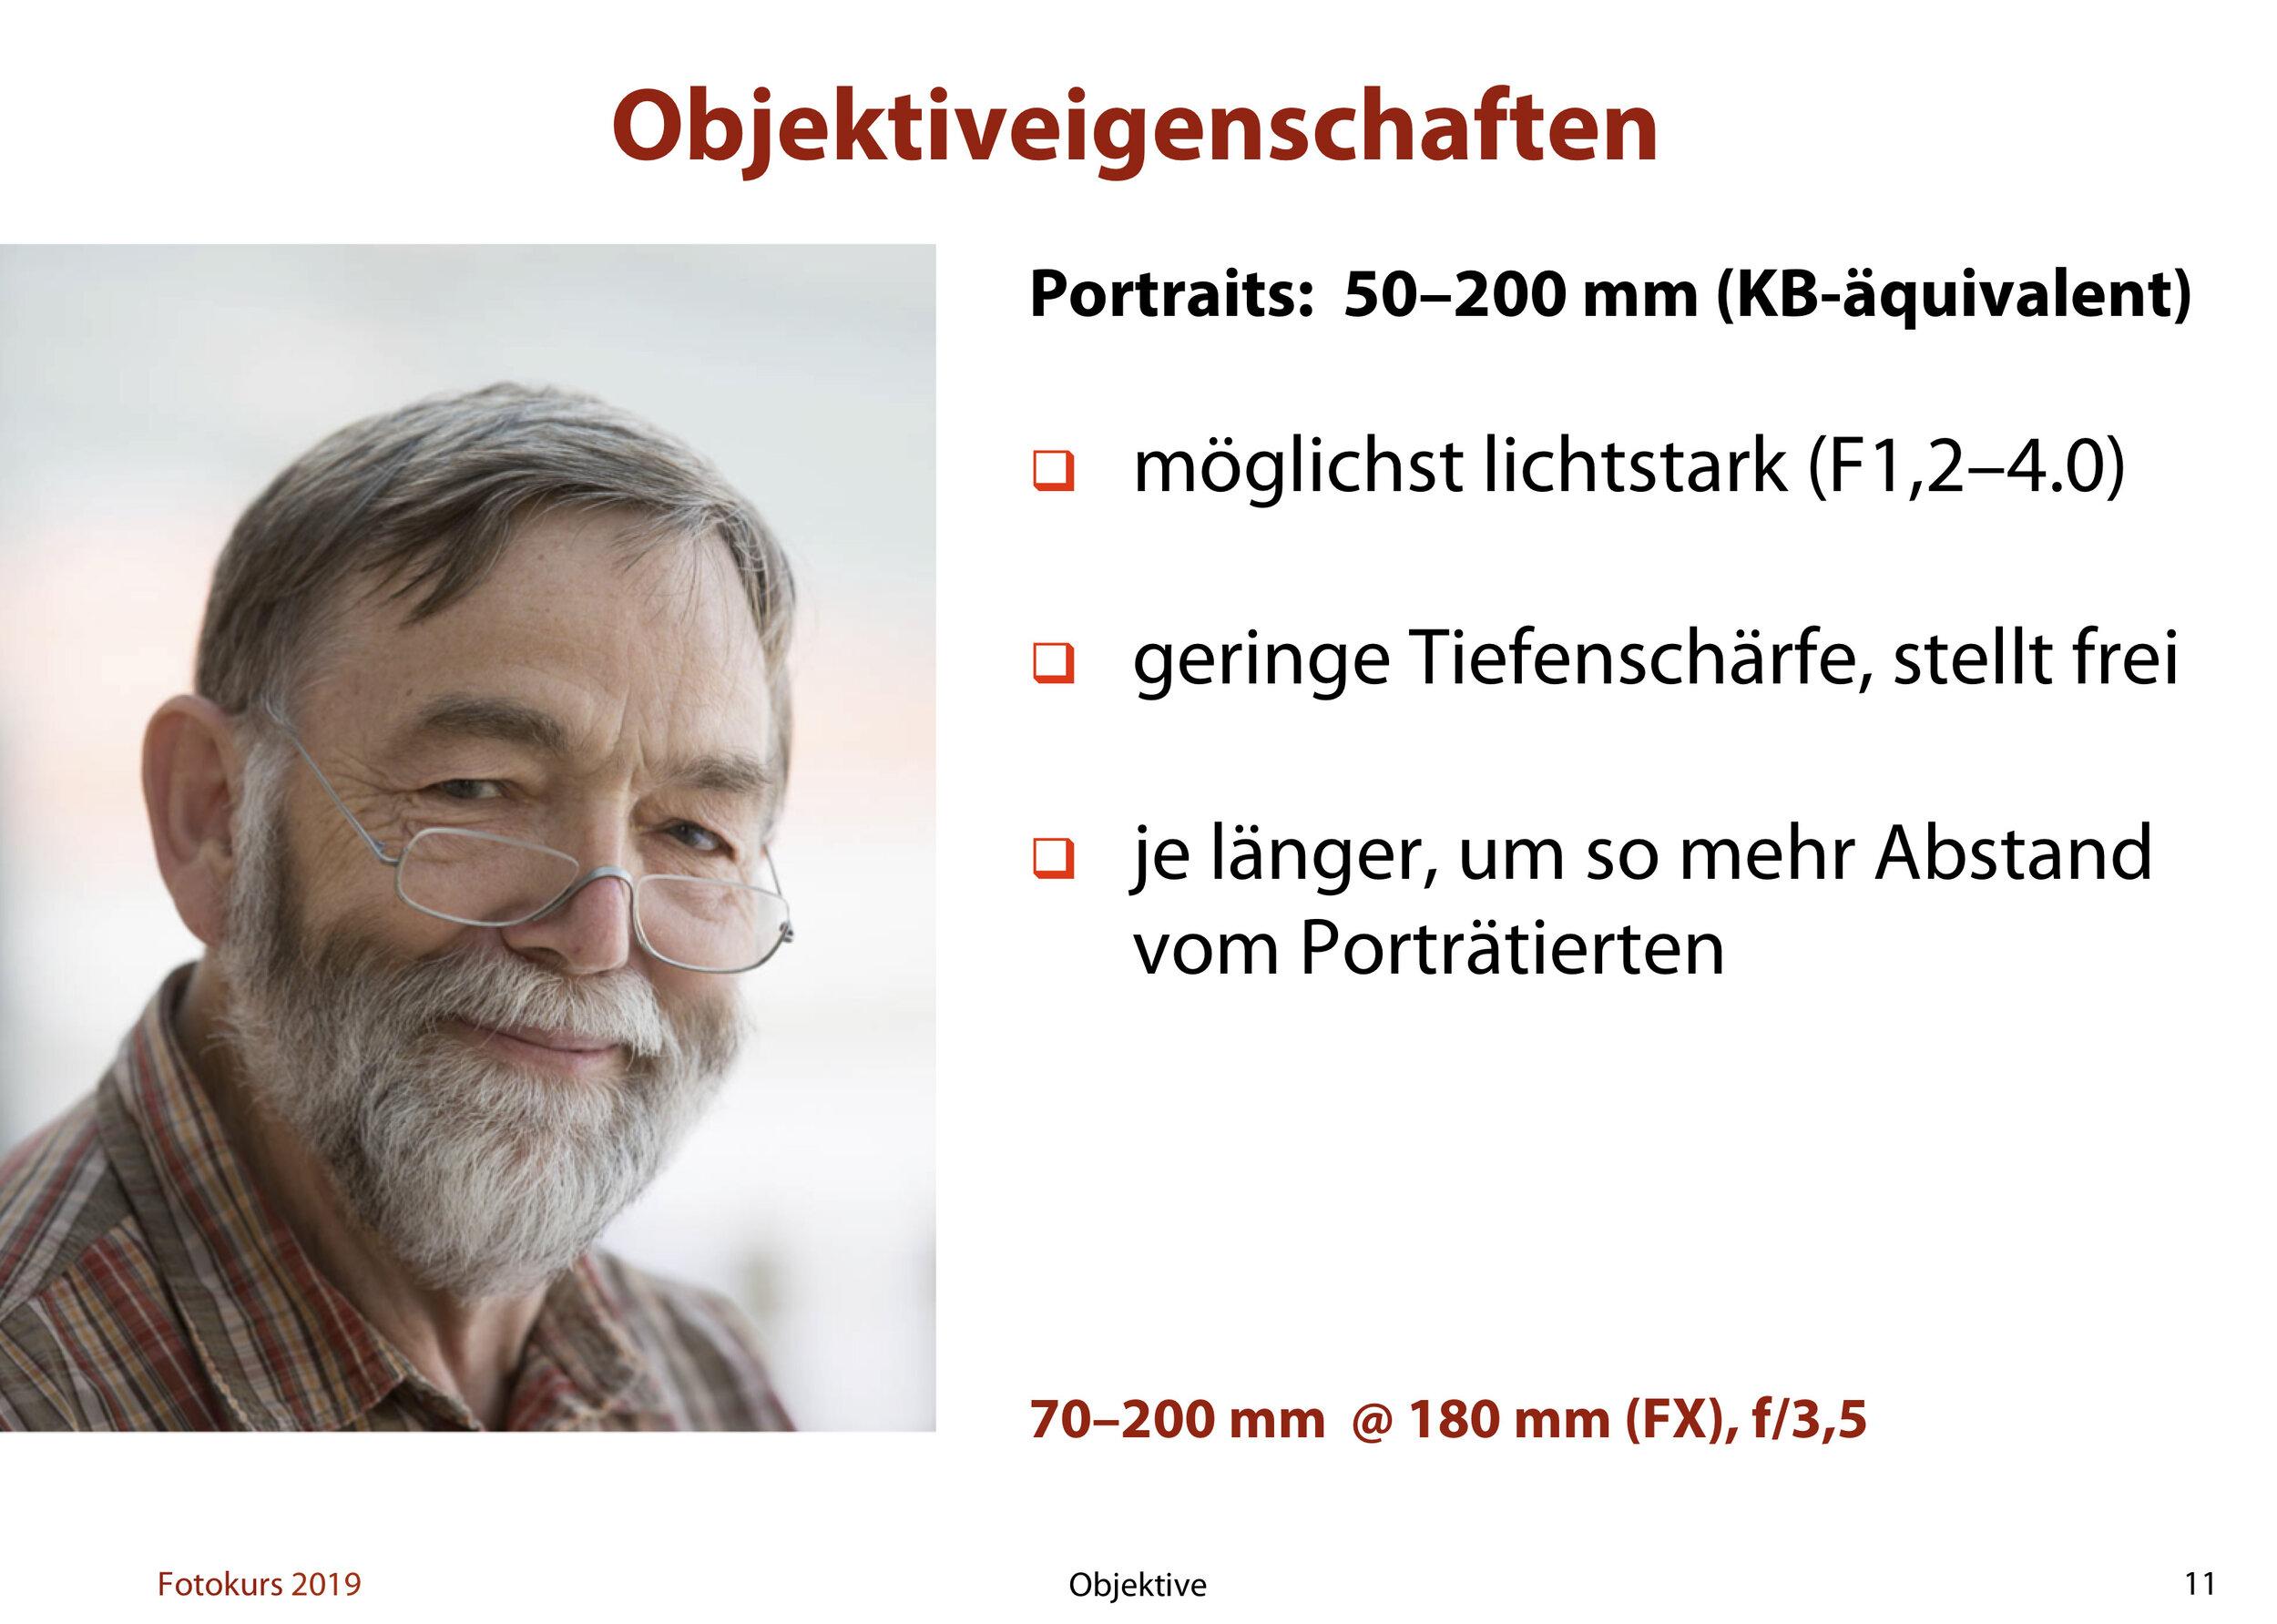 Objektiv-Eigenschaften-2.jpg